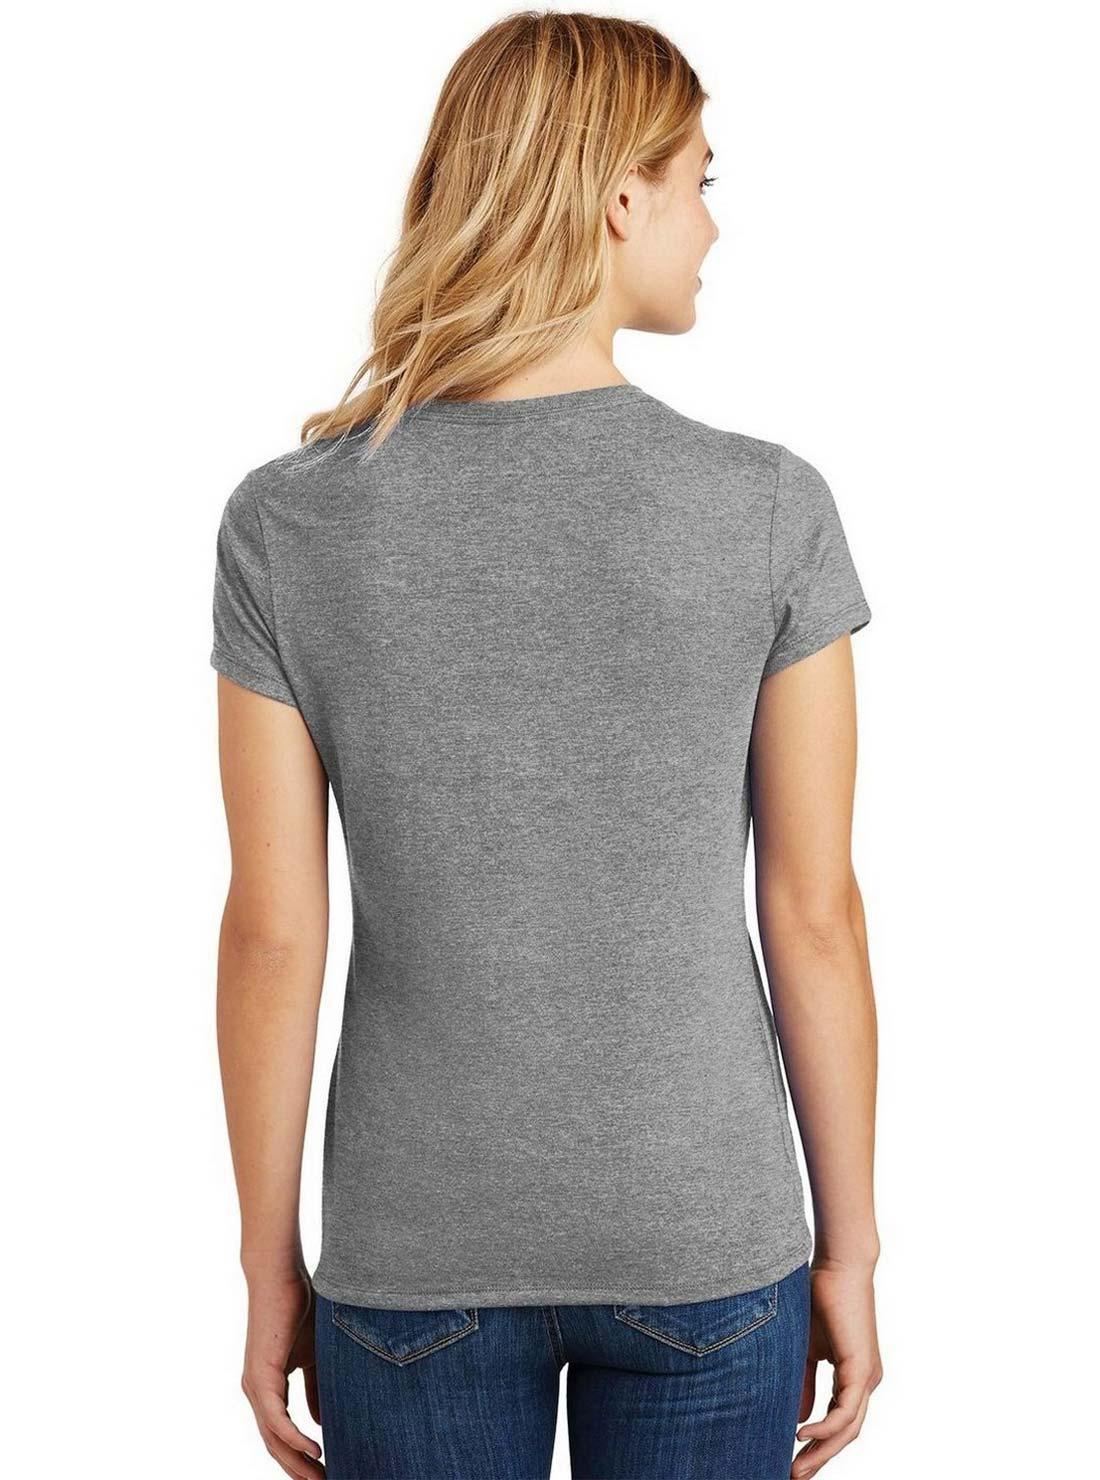 Camiseta Feminina T-Shirt London Big Ben ES_060